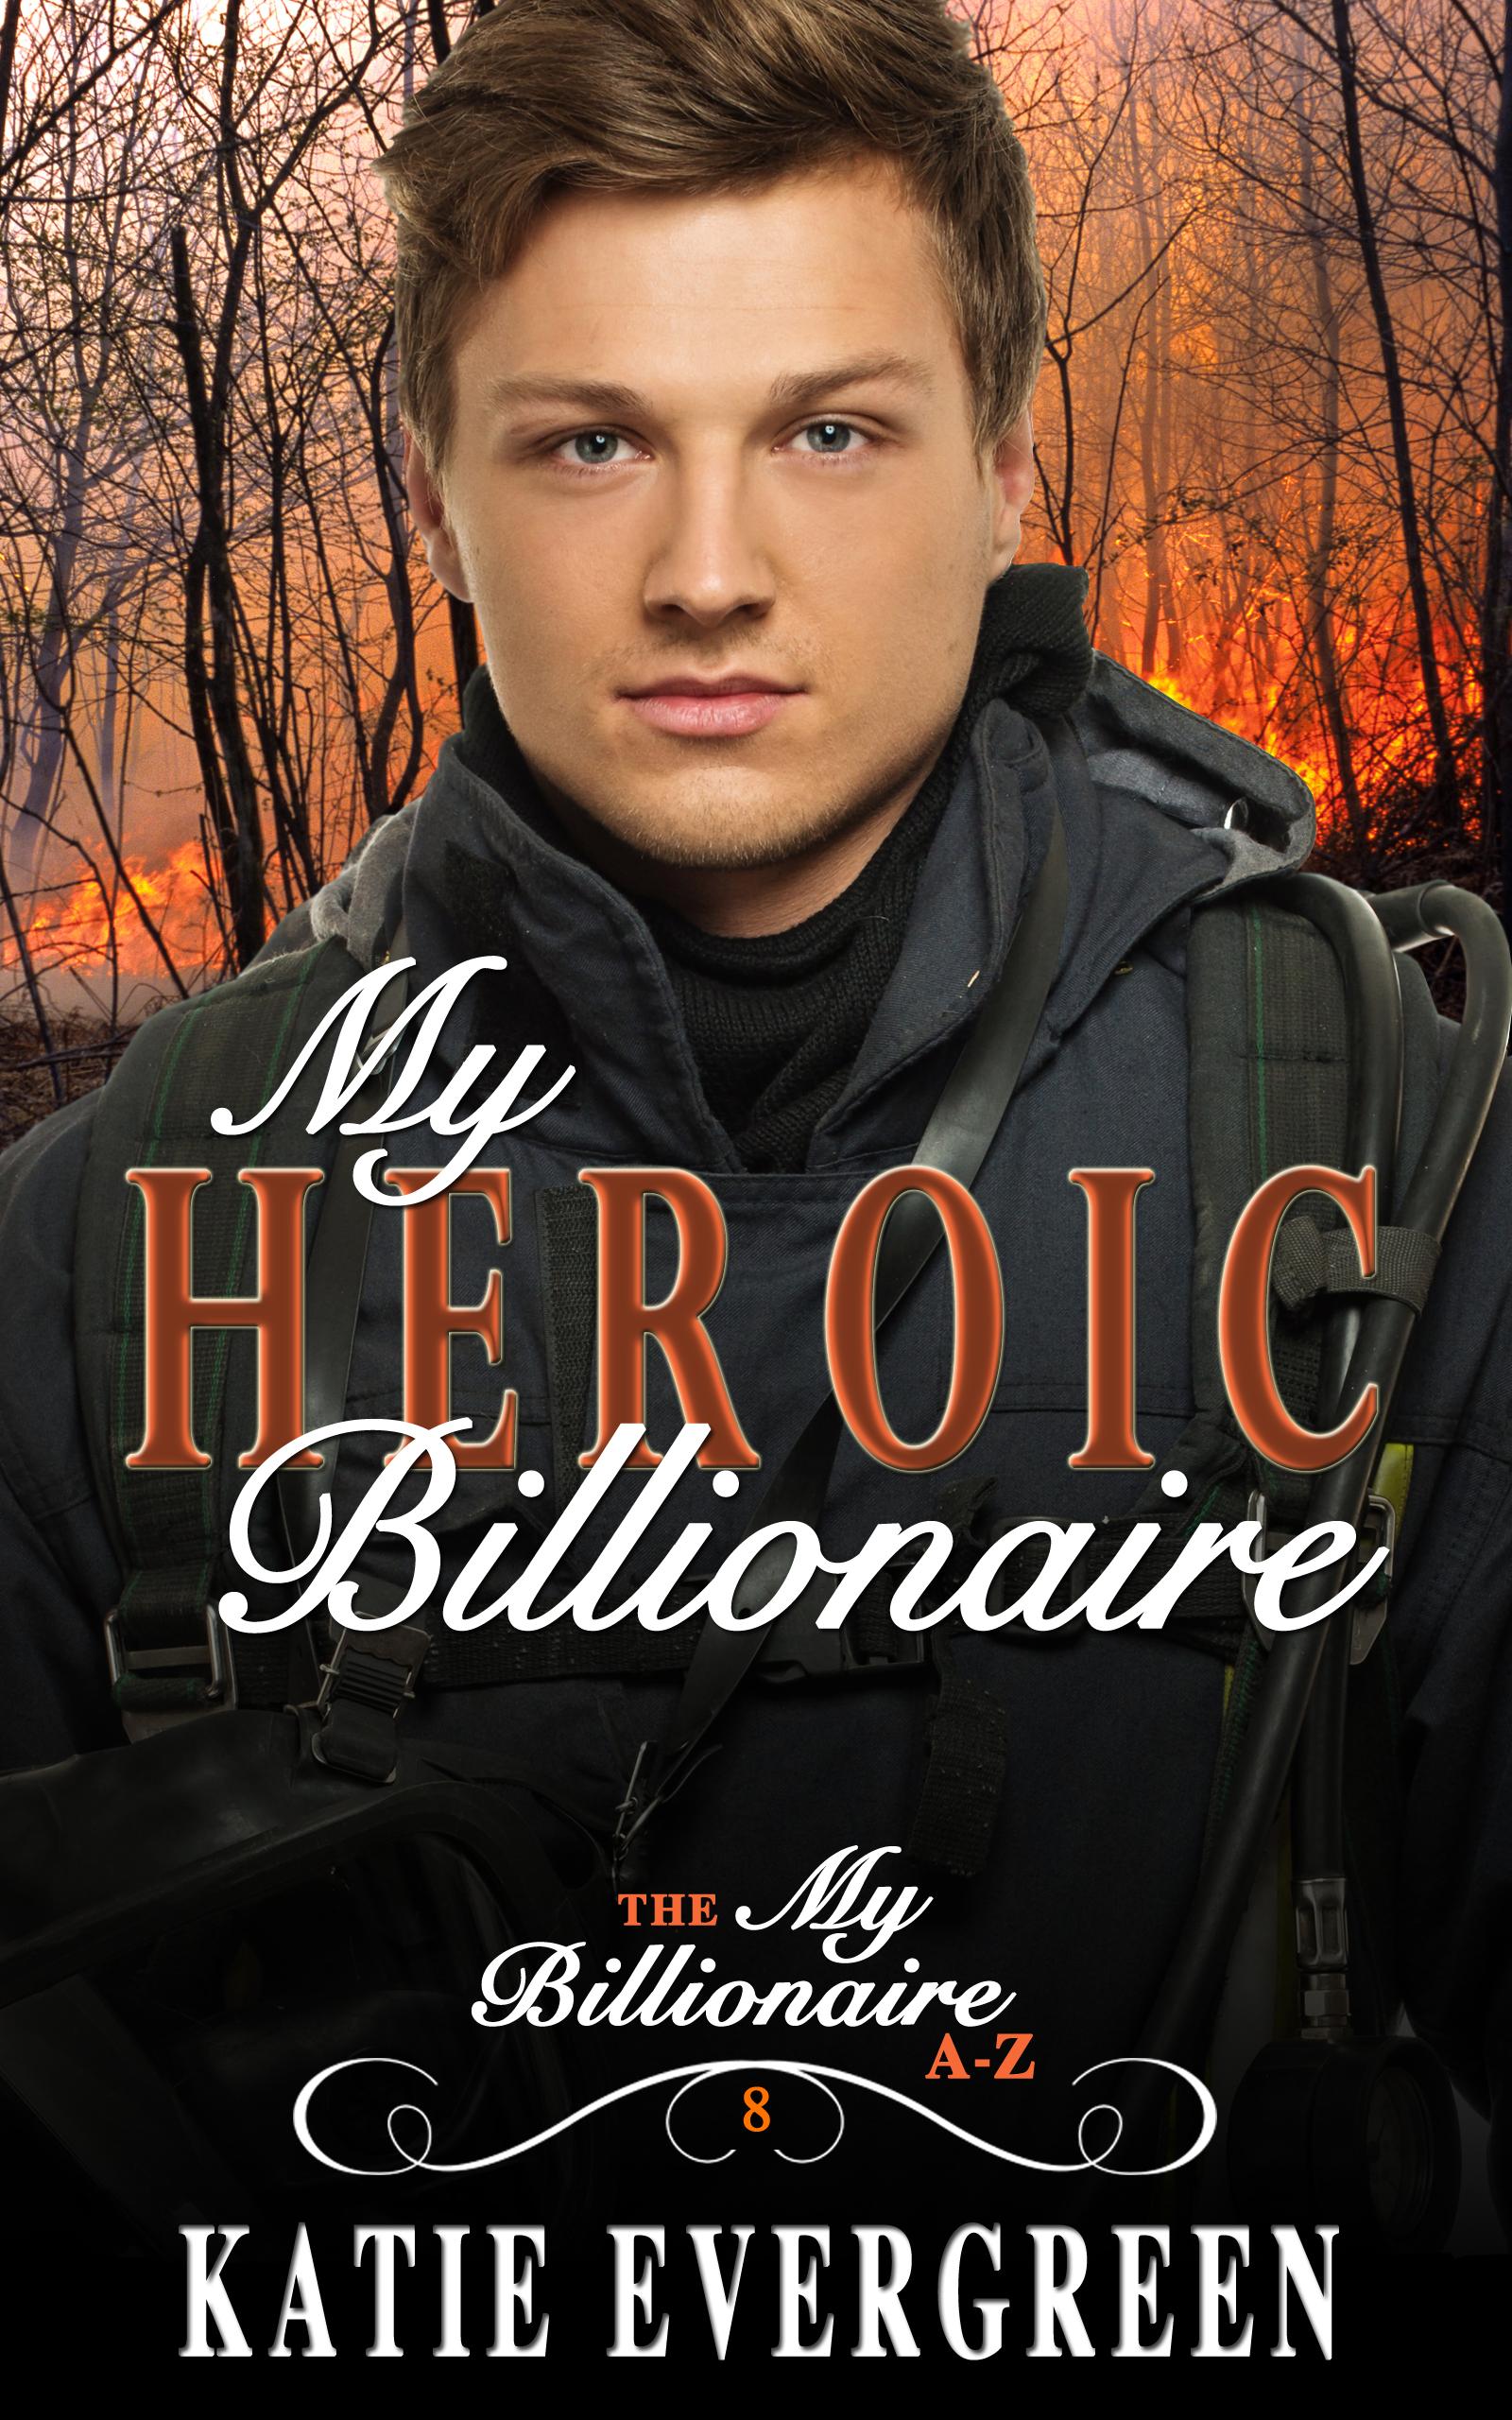 My Heroic Billionaire